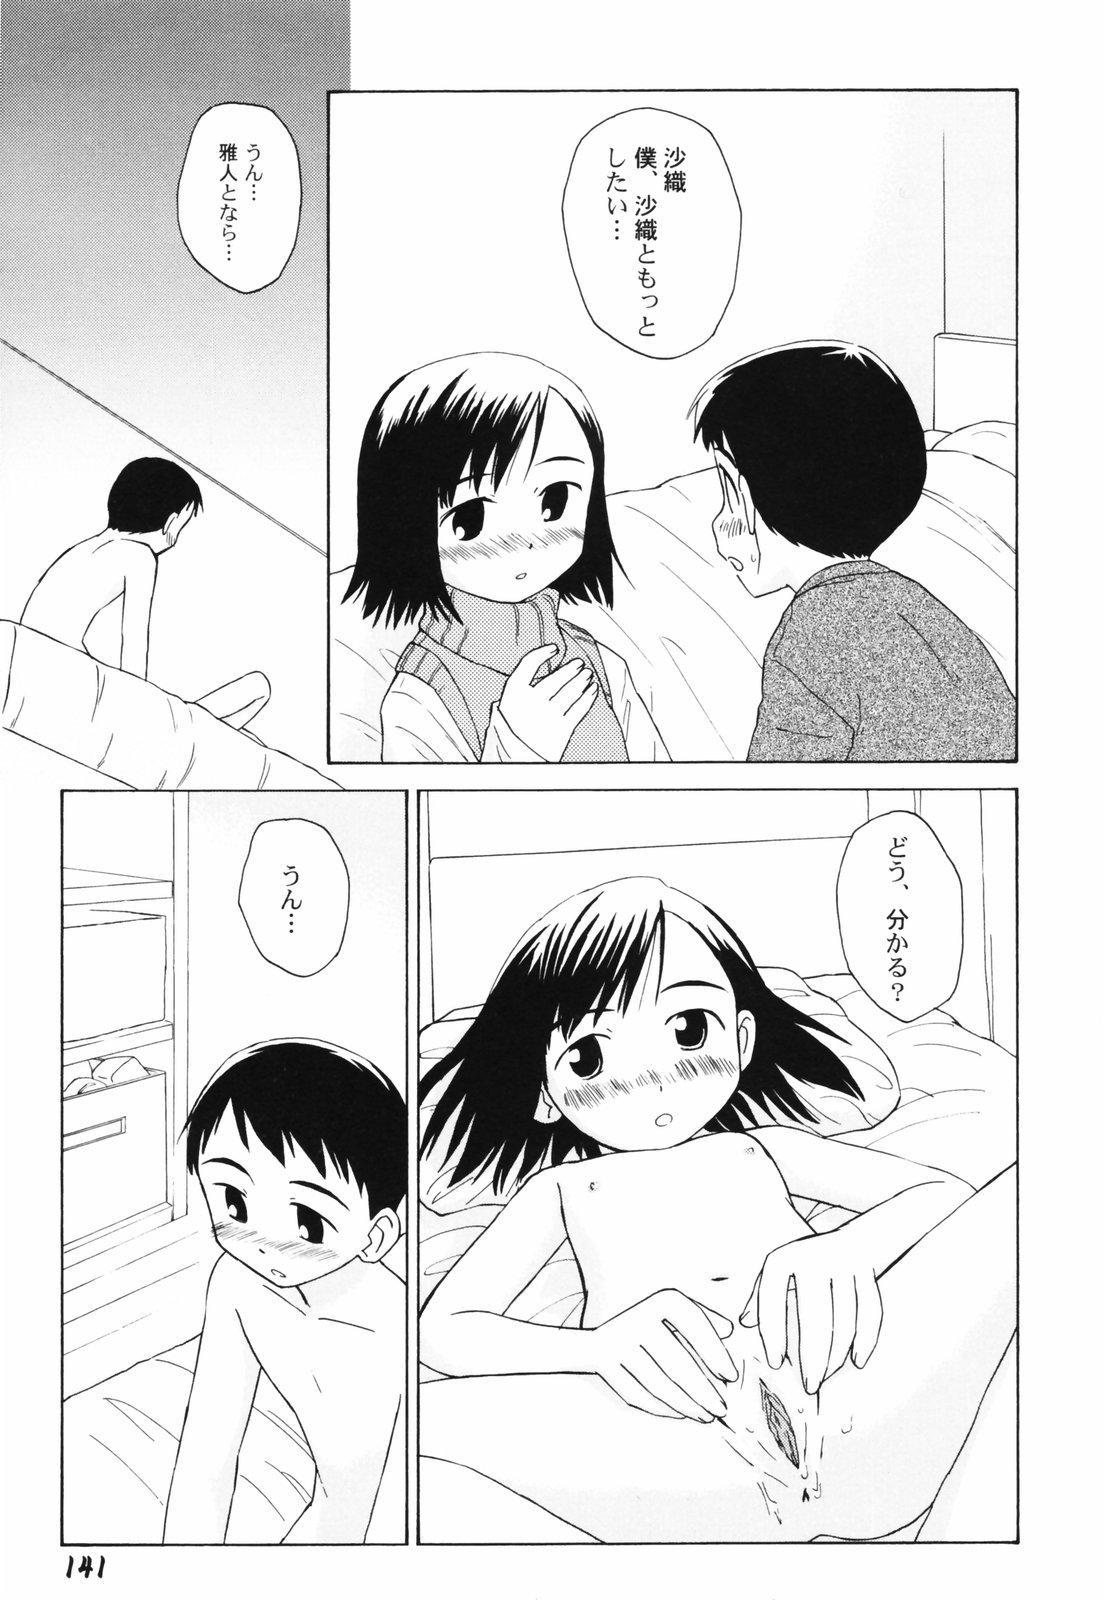 Hanjuku Shoujo 143